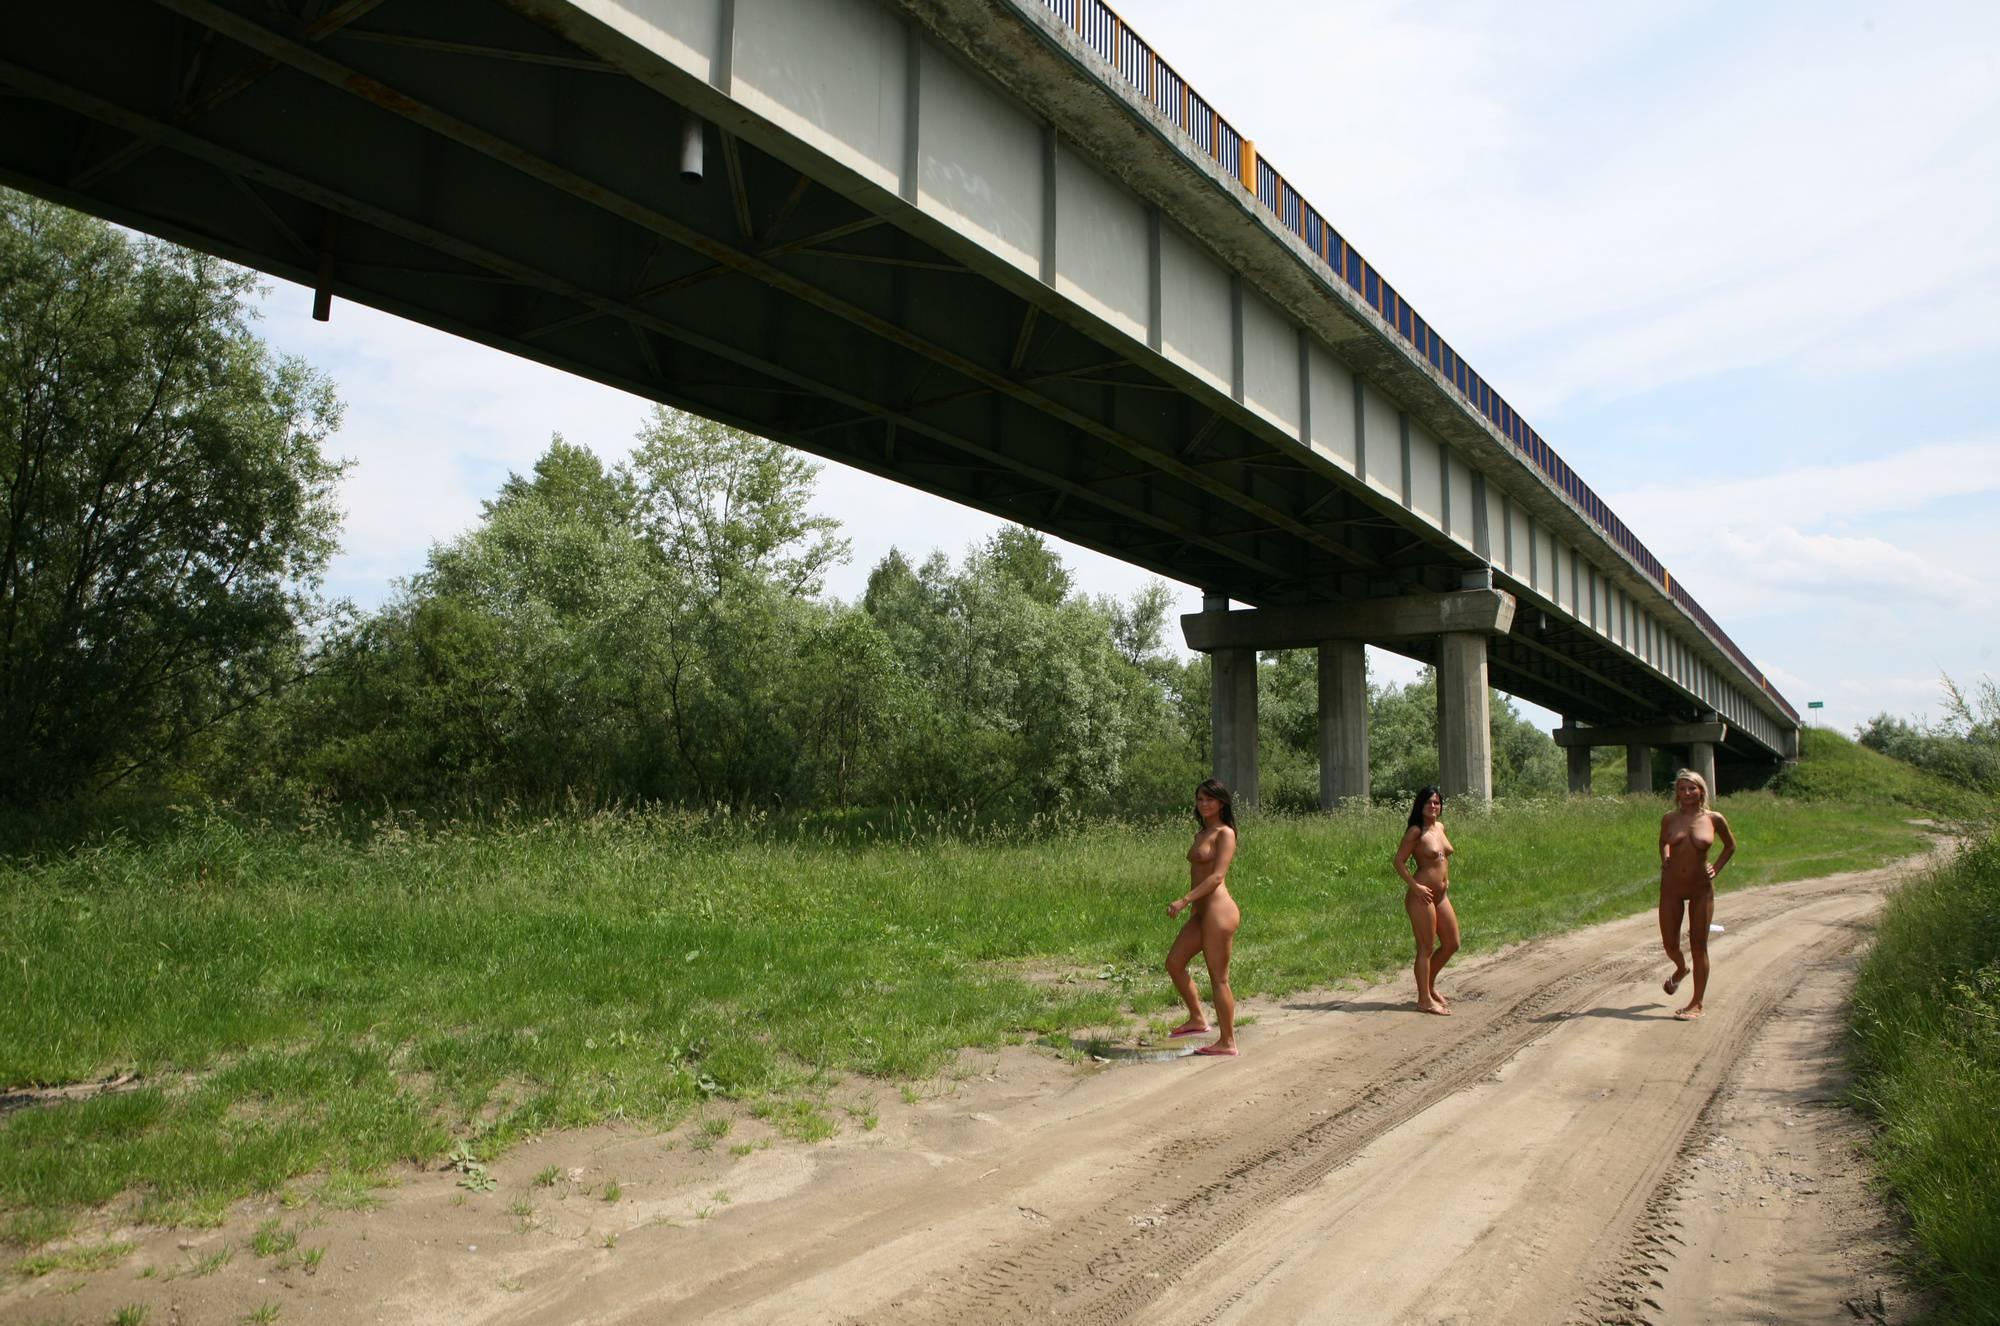 Nudist Pics Park Under The Bridge - 1